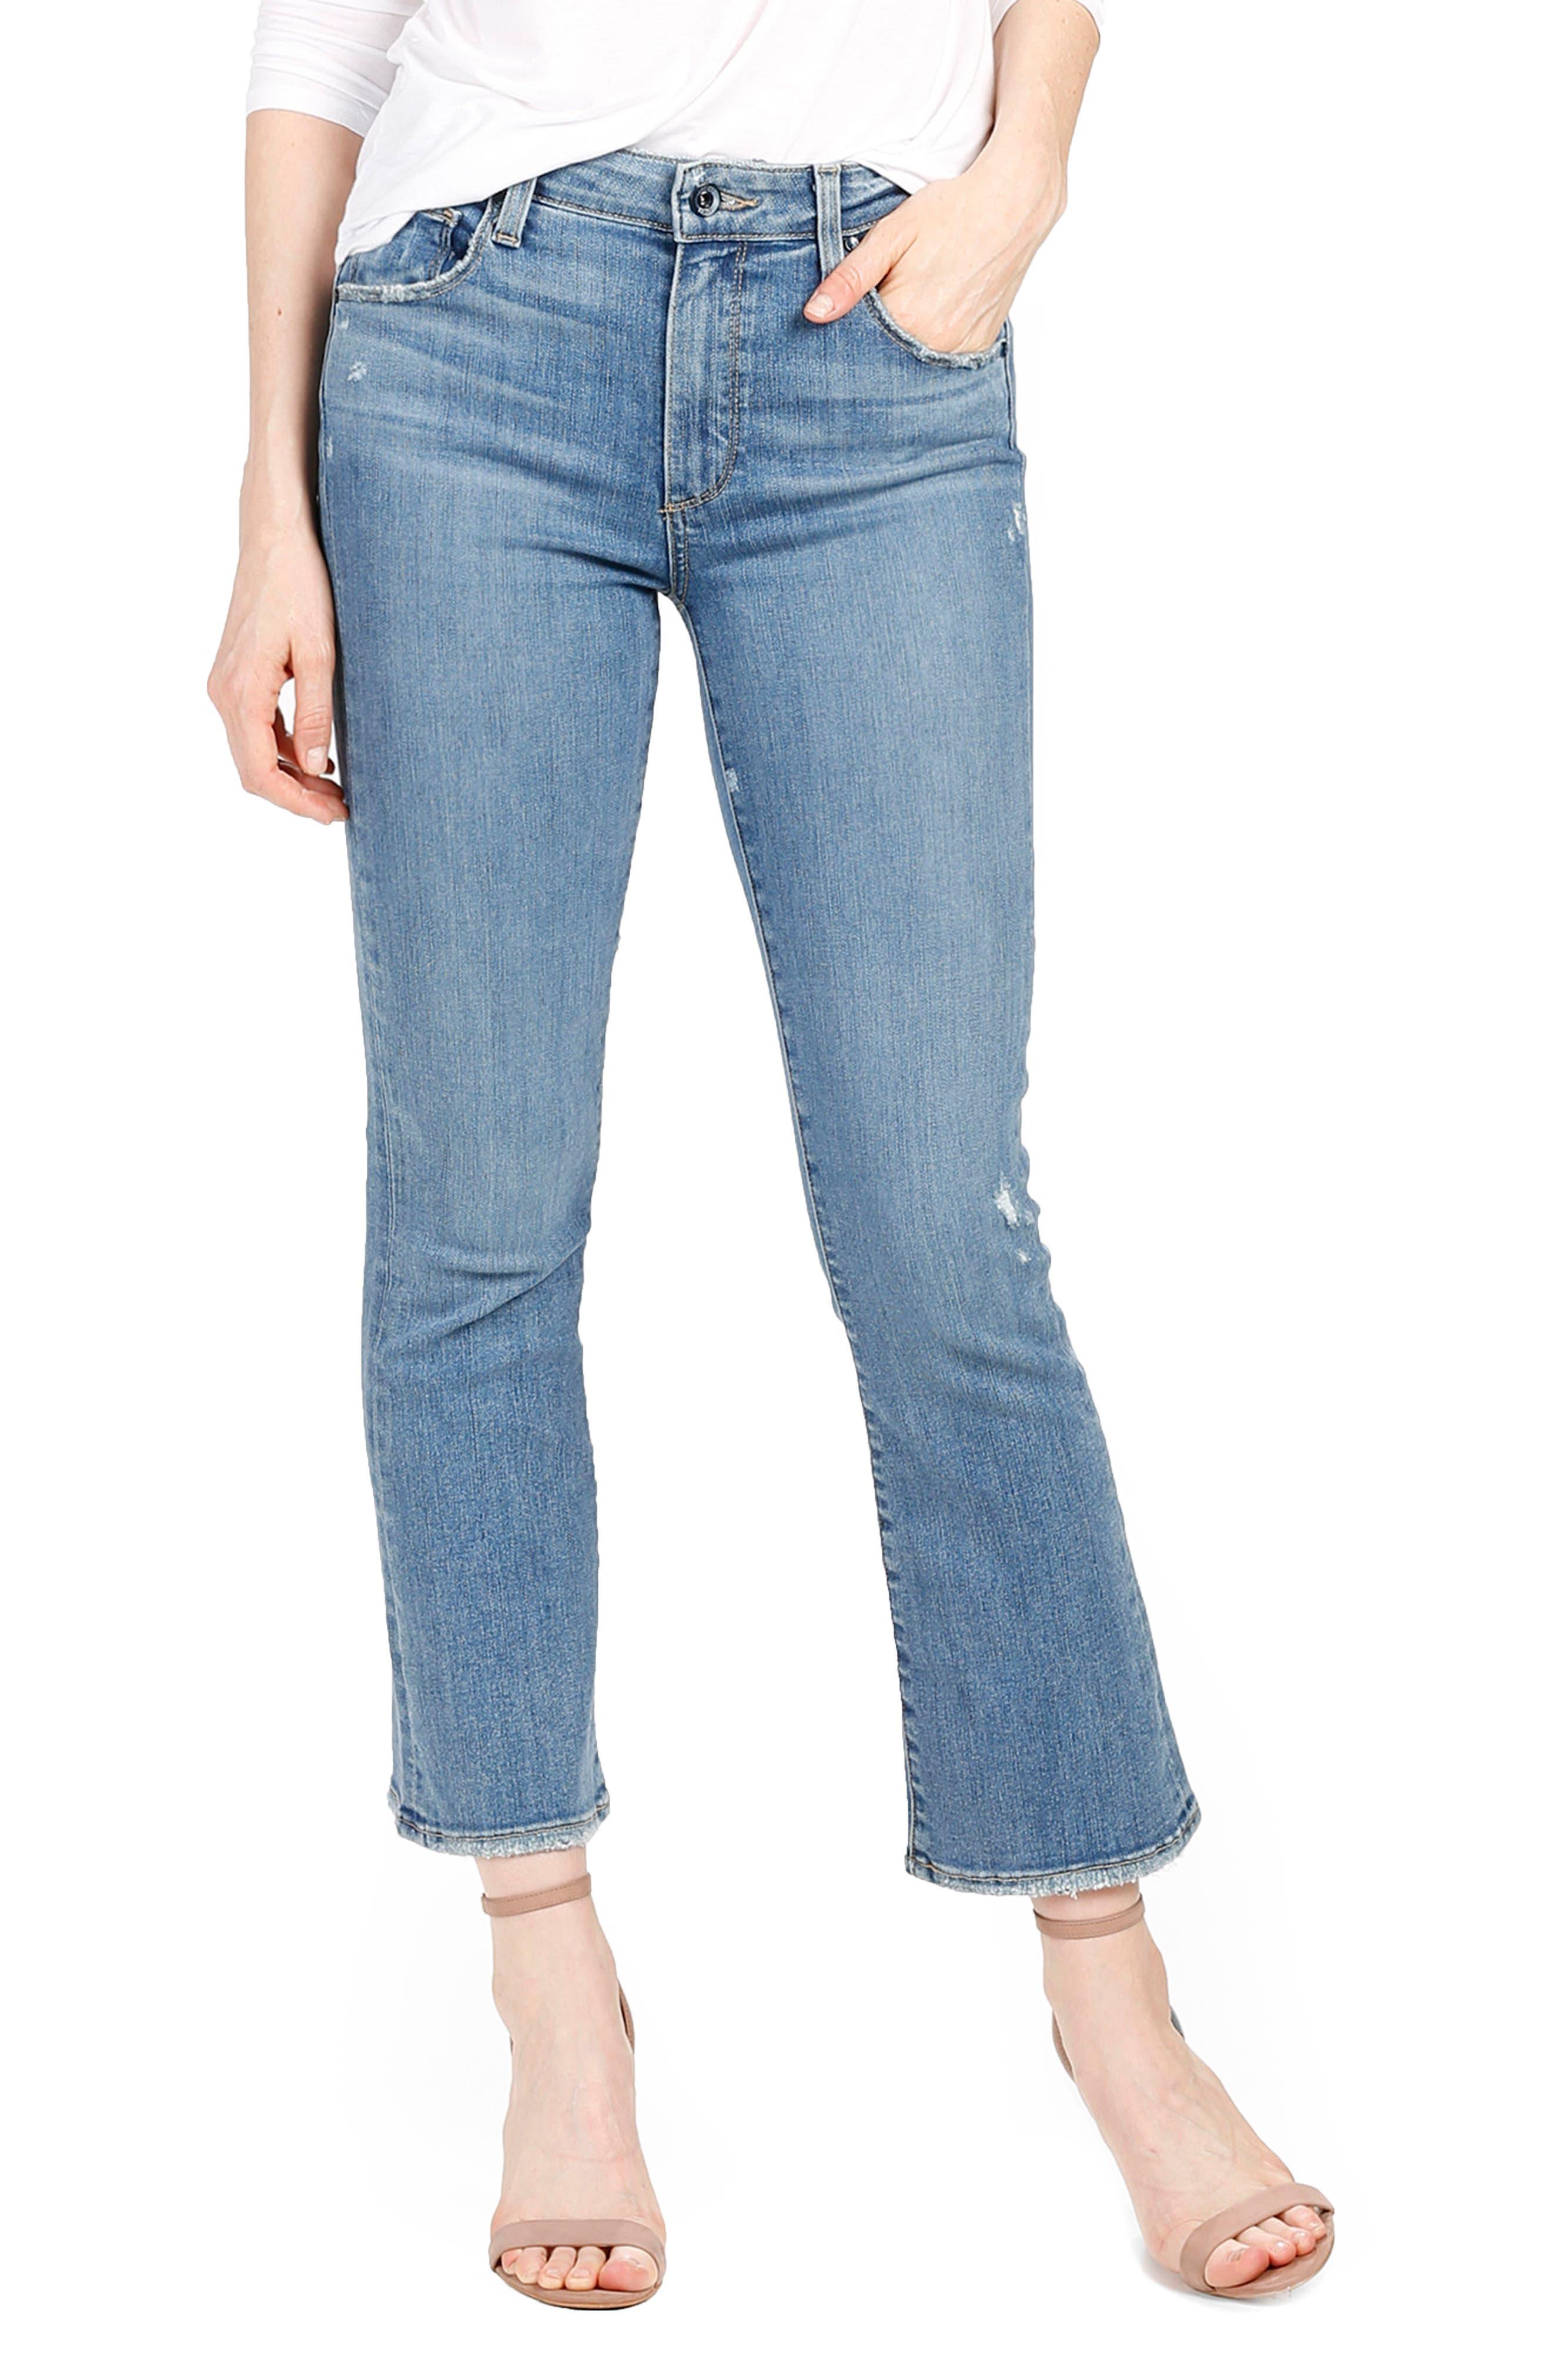 Main Image - PAIGE Transcend - Colette High Waist Crop Flare Jeans (Sienna)